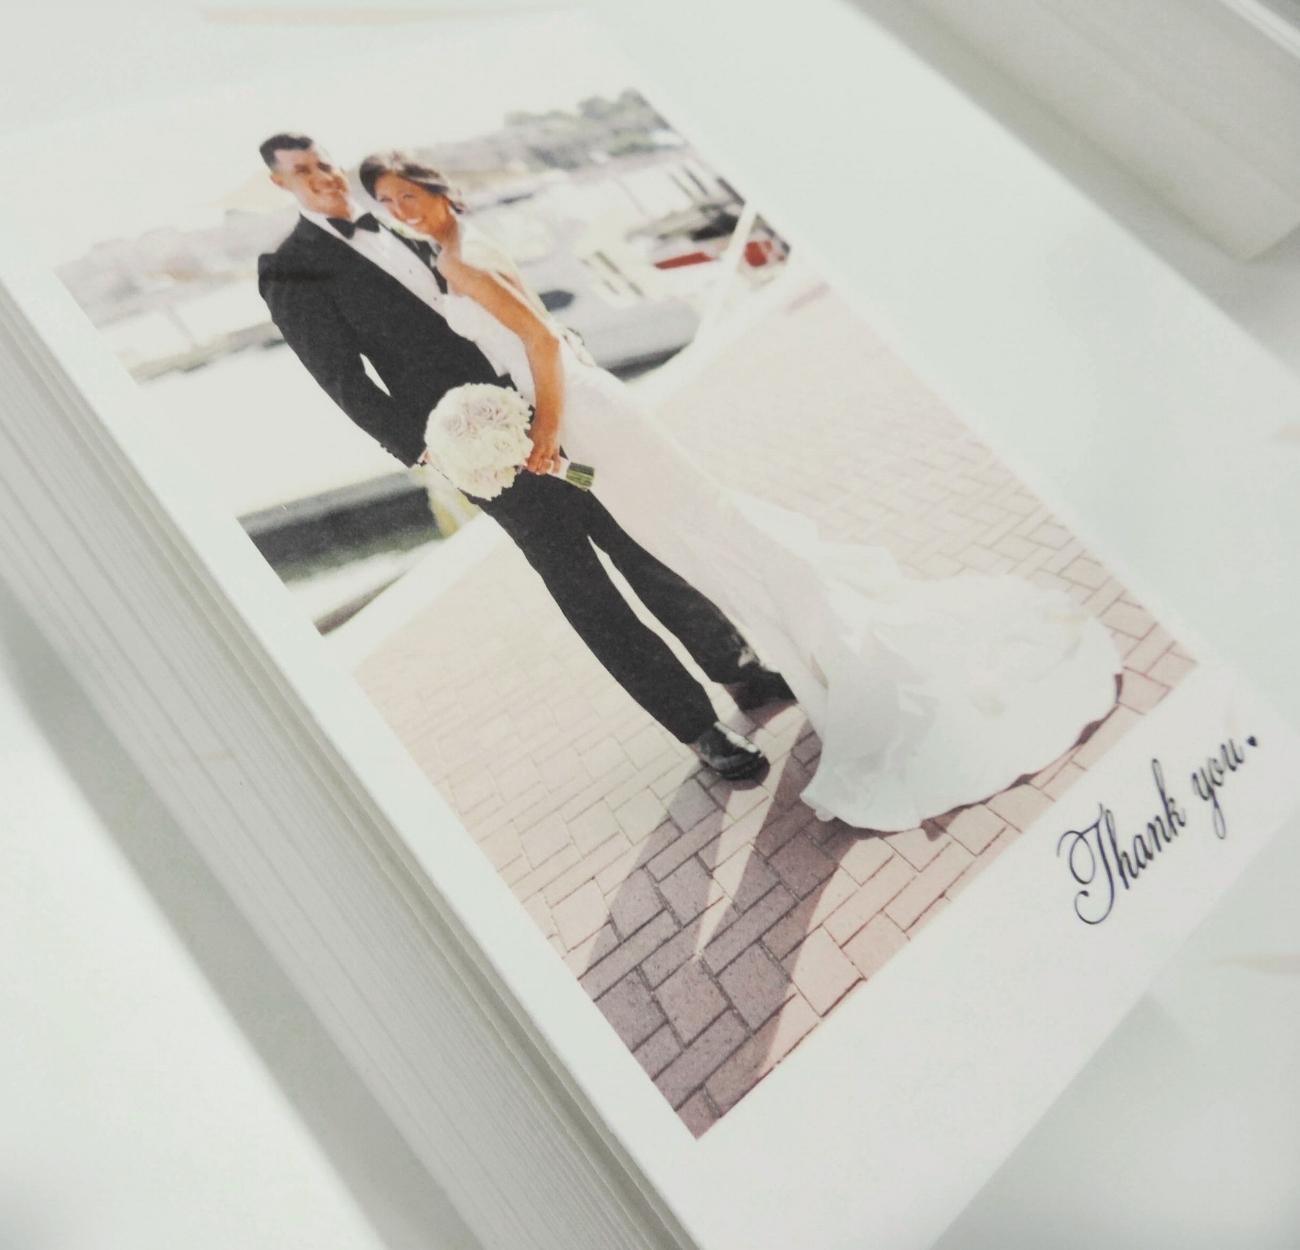 Thank you cards - 90# Crane cotton white. Designed by Ali Schroder |Stephanie Bradshaw